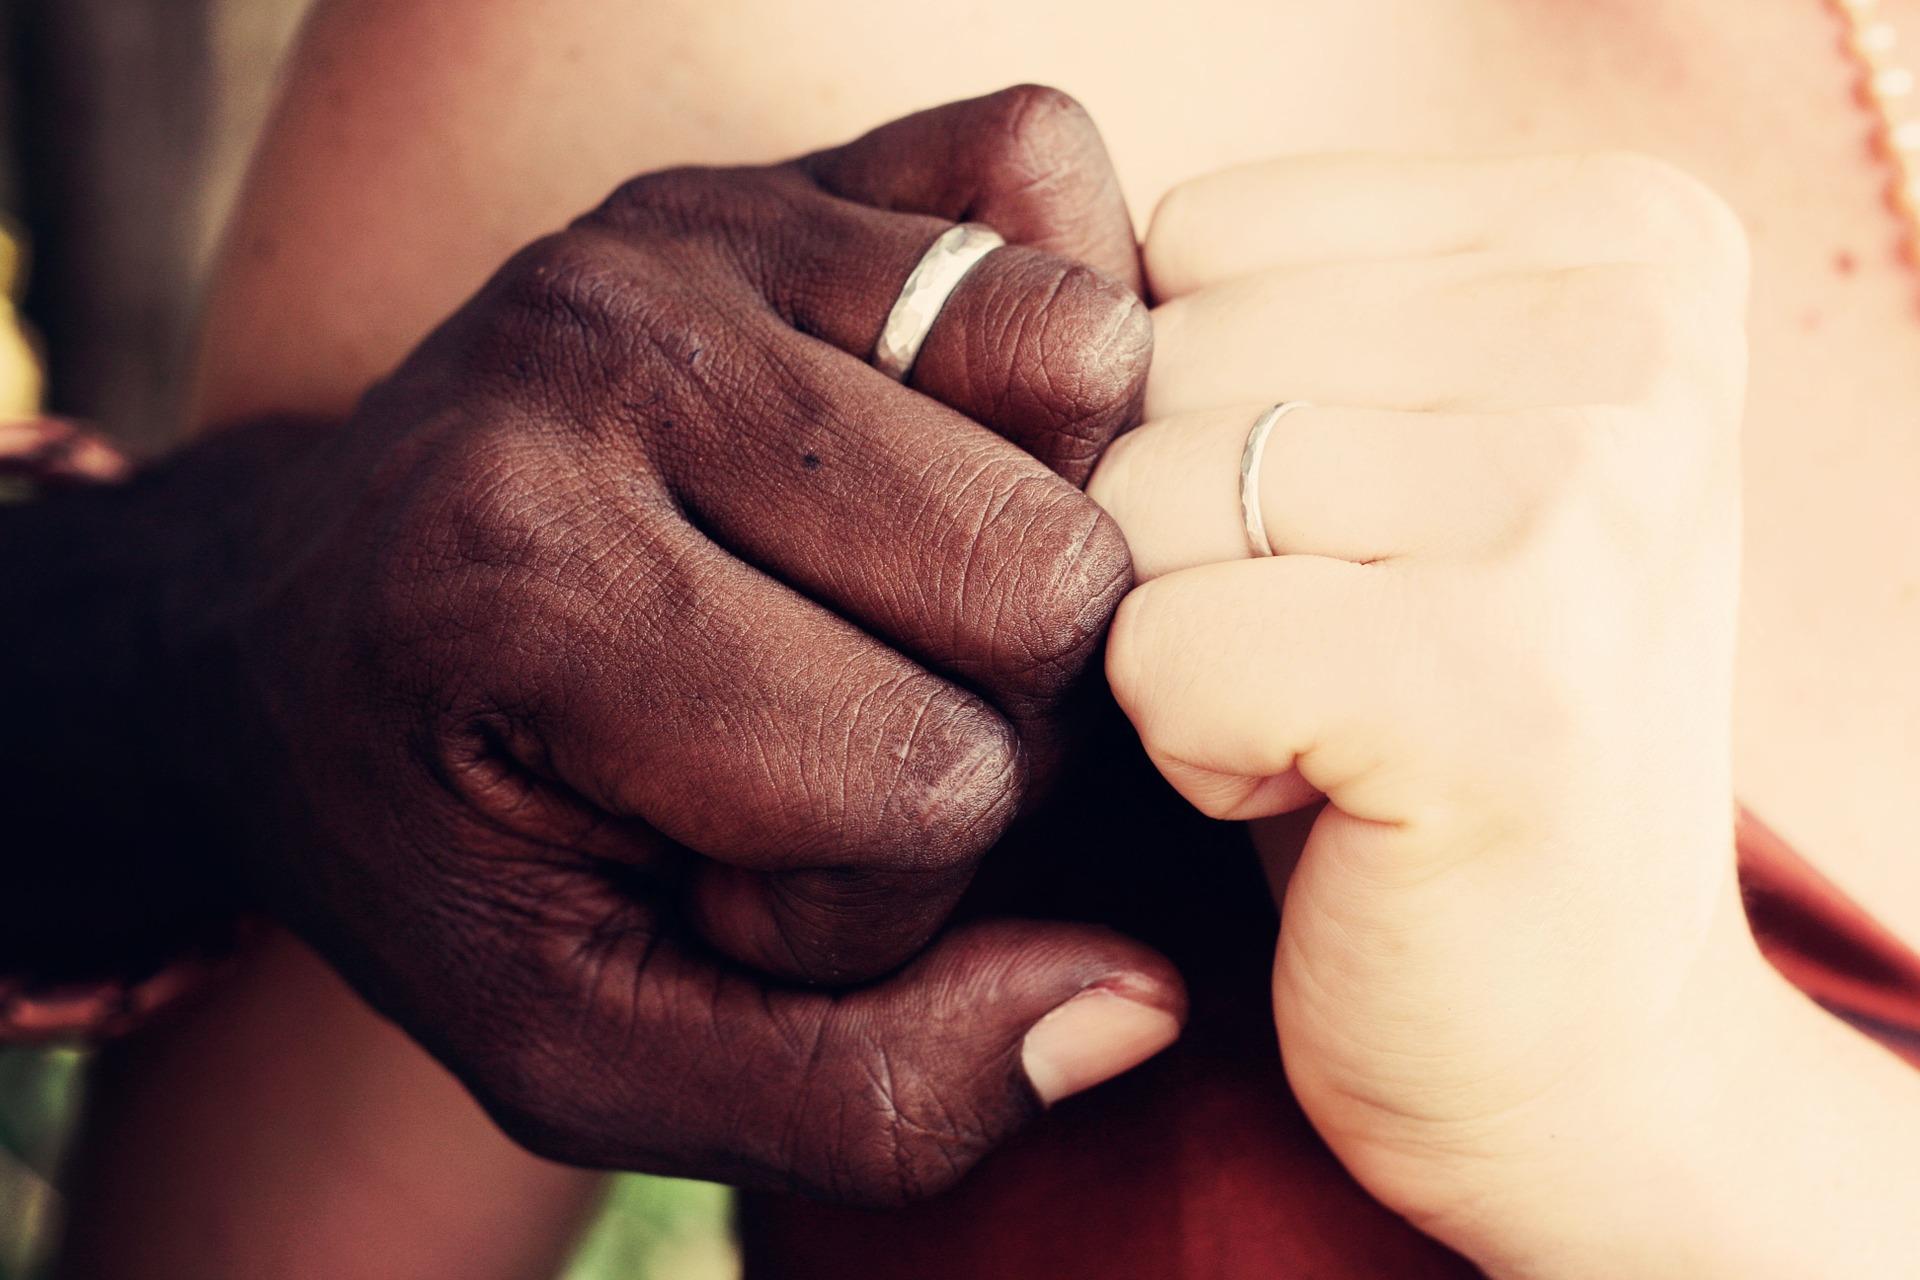 幸せ 差別 LGBT 結婚 同性婚